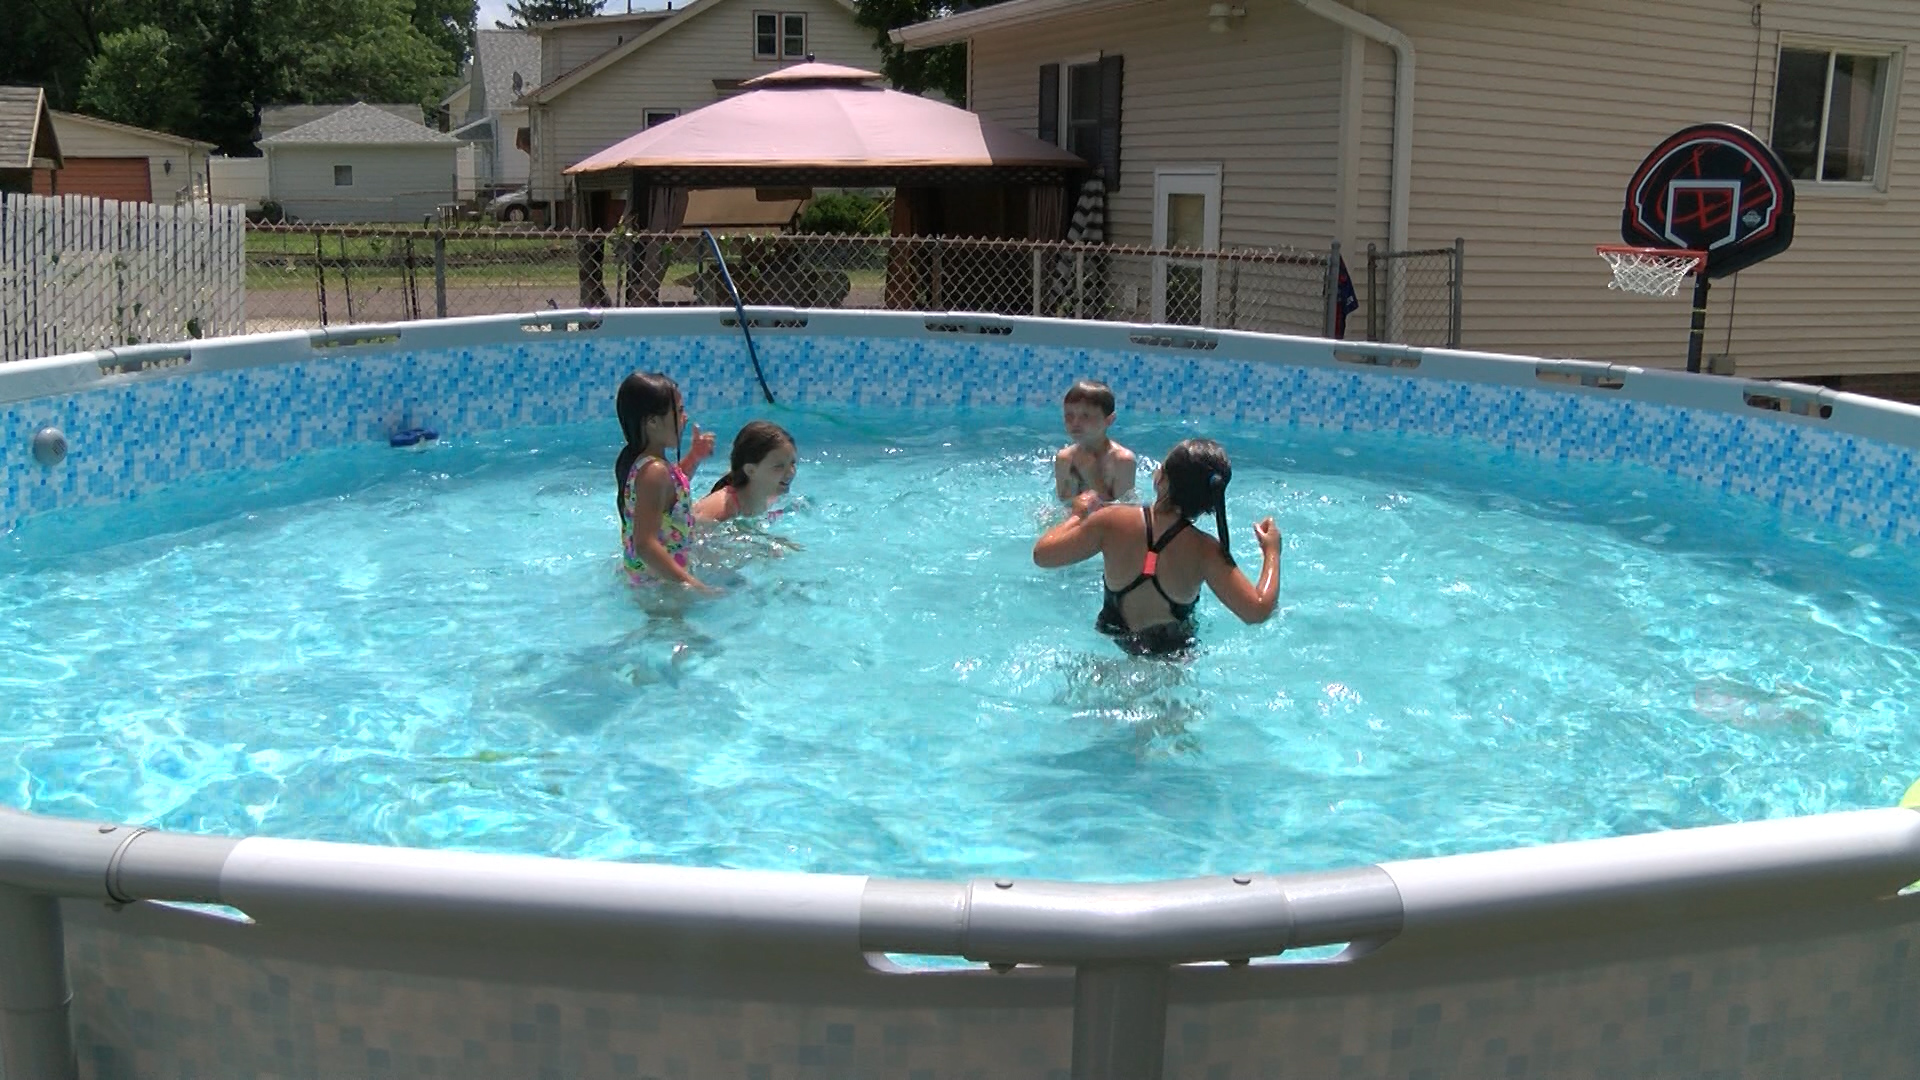 Pool safety_1529532496407.jpg.jpg